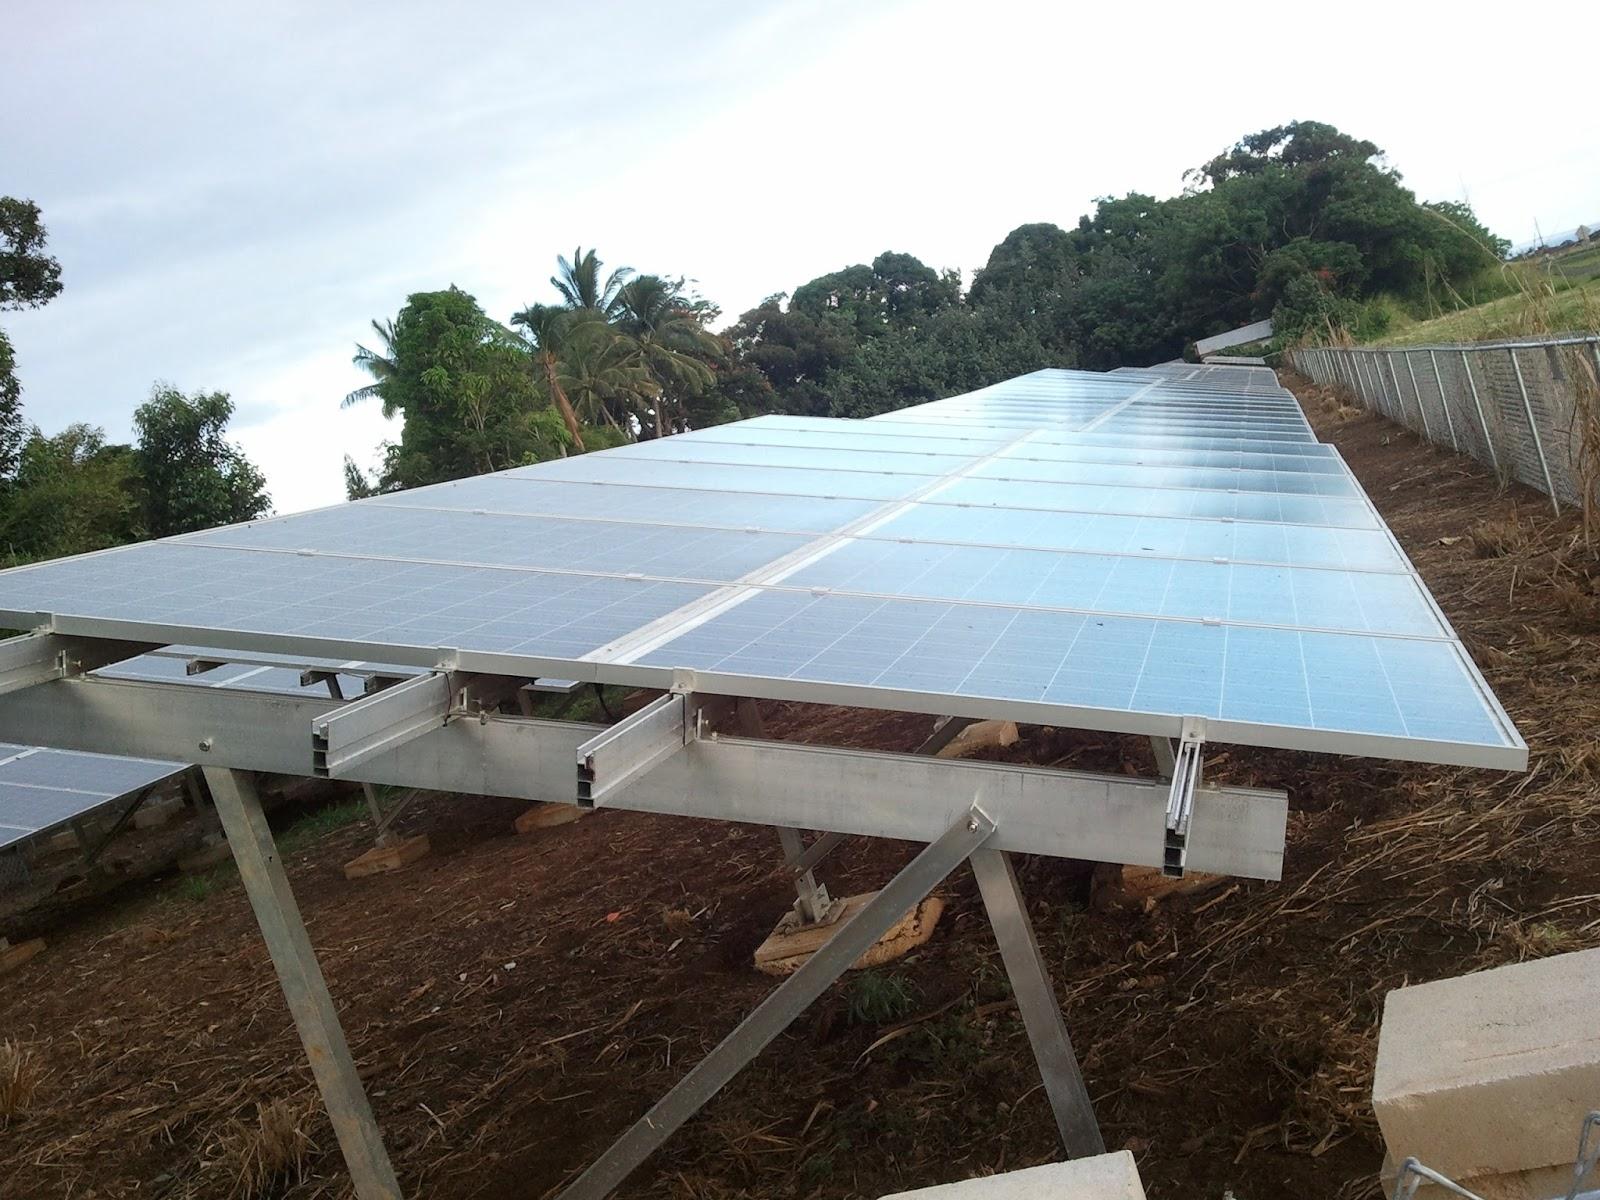 HECO & MECO Proposed Renewable Energy RFP Raises Questions